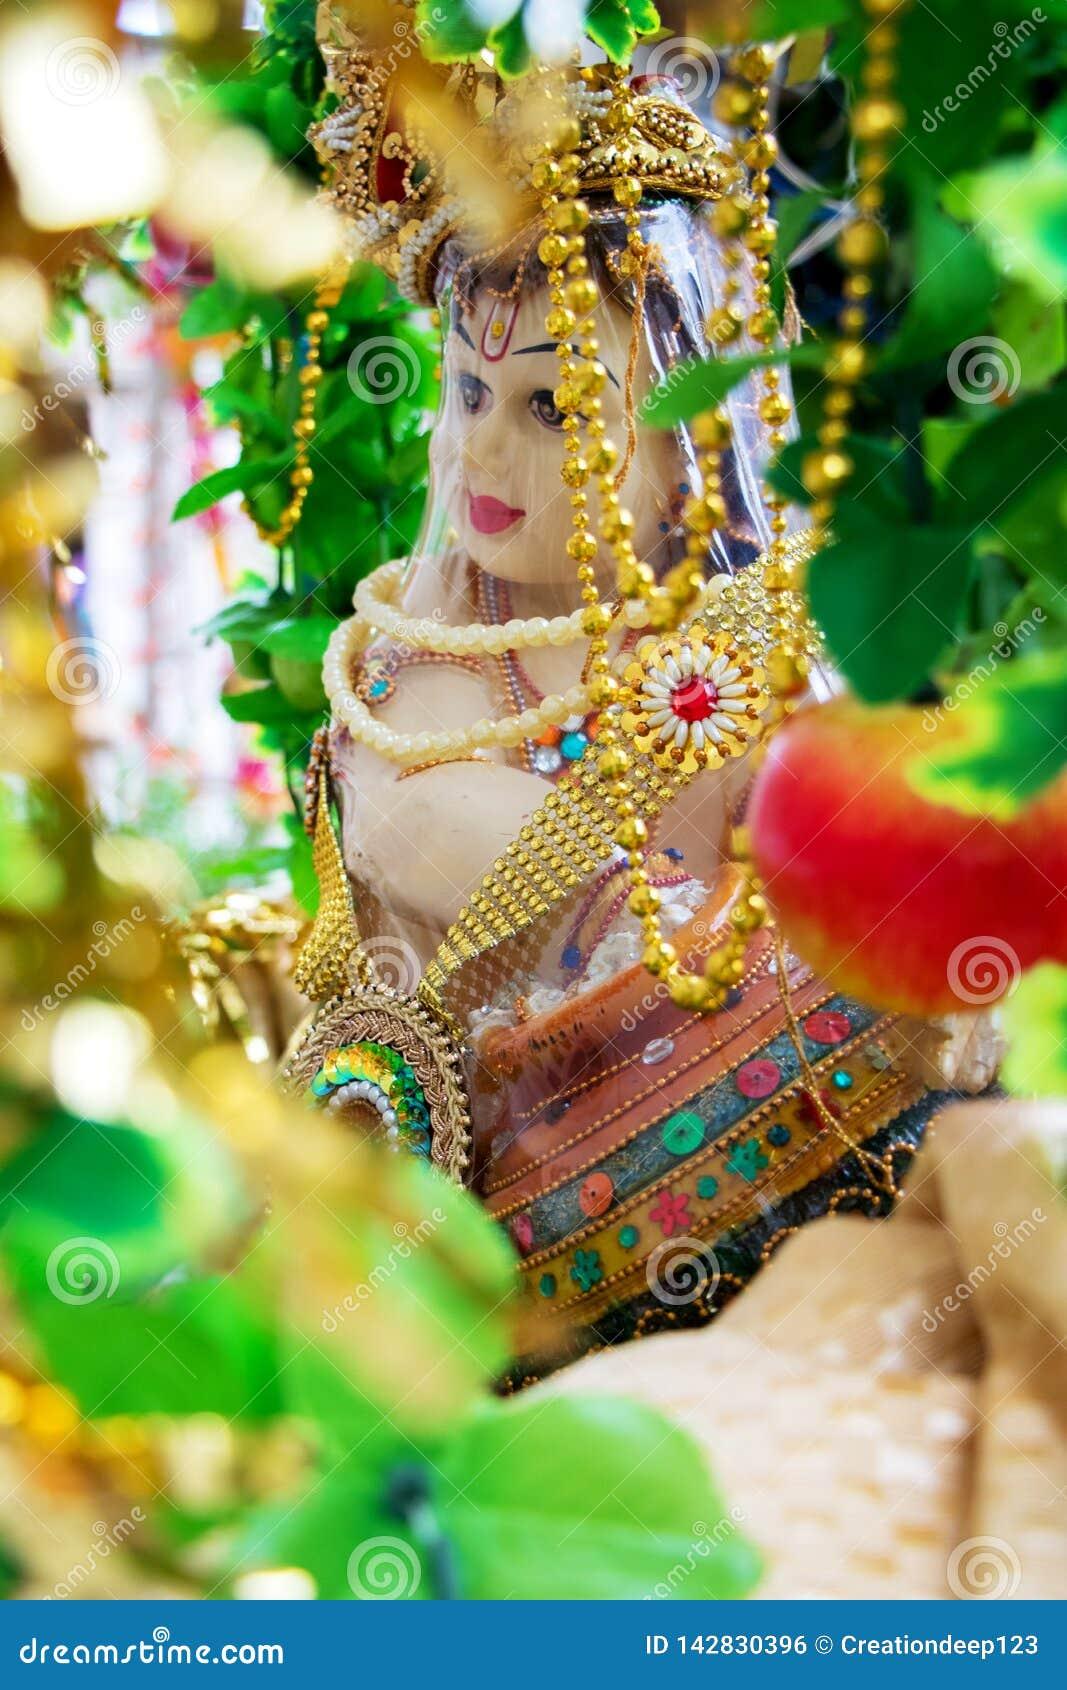 The Hindu God, Lord Krishna, Stock Photo - Image of religious, lord